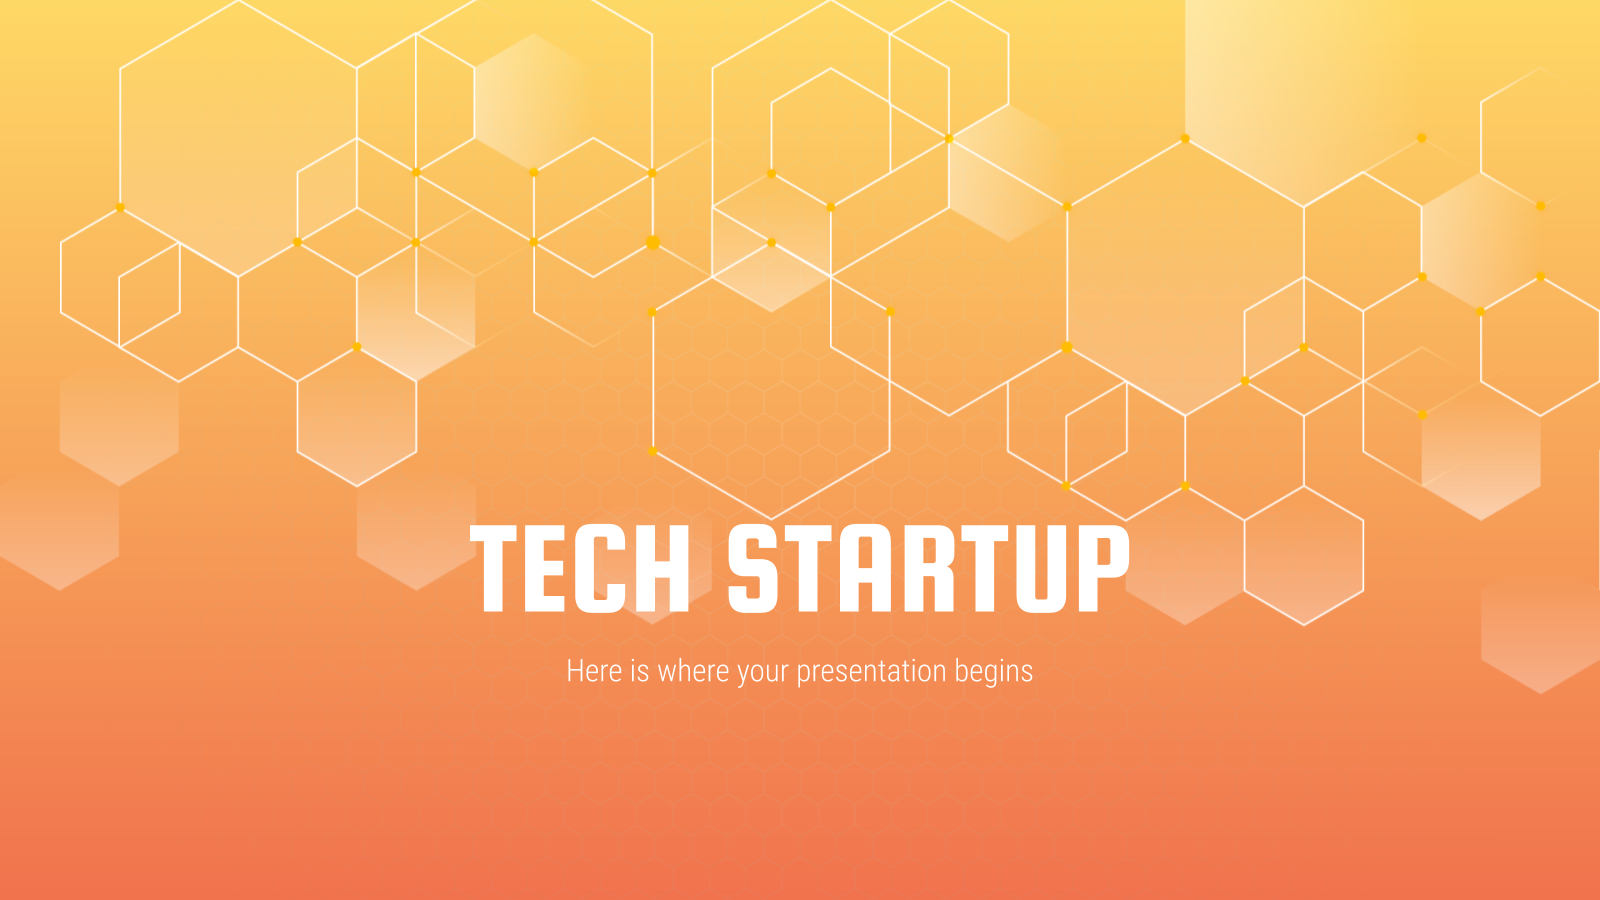 Tech Startup presentation template